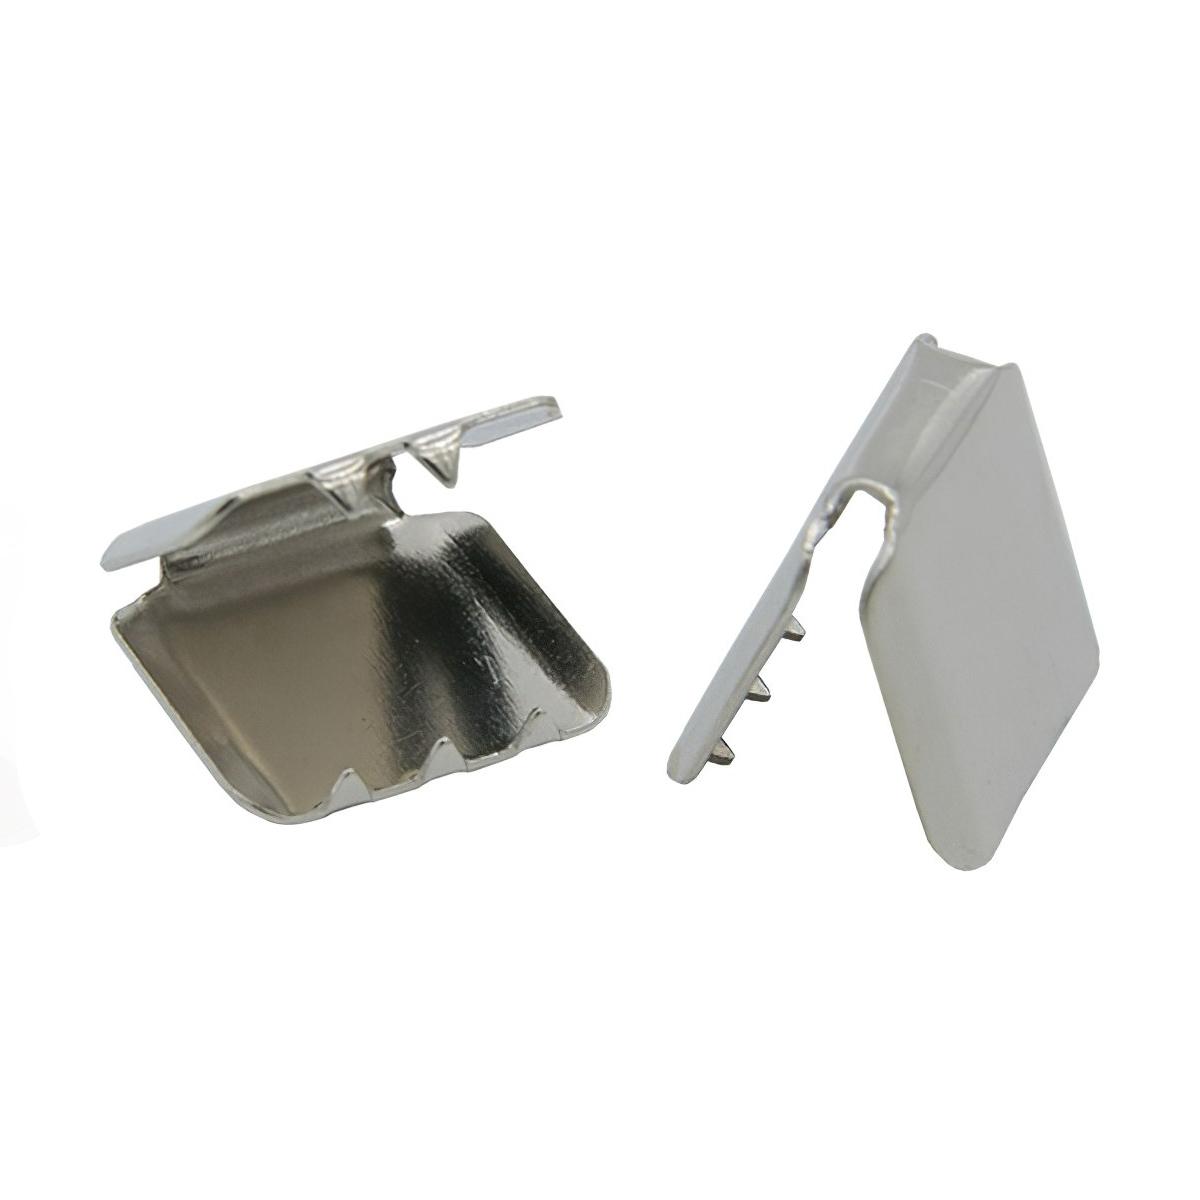 ГД313842 Зажим 10*10мм (никель)